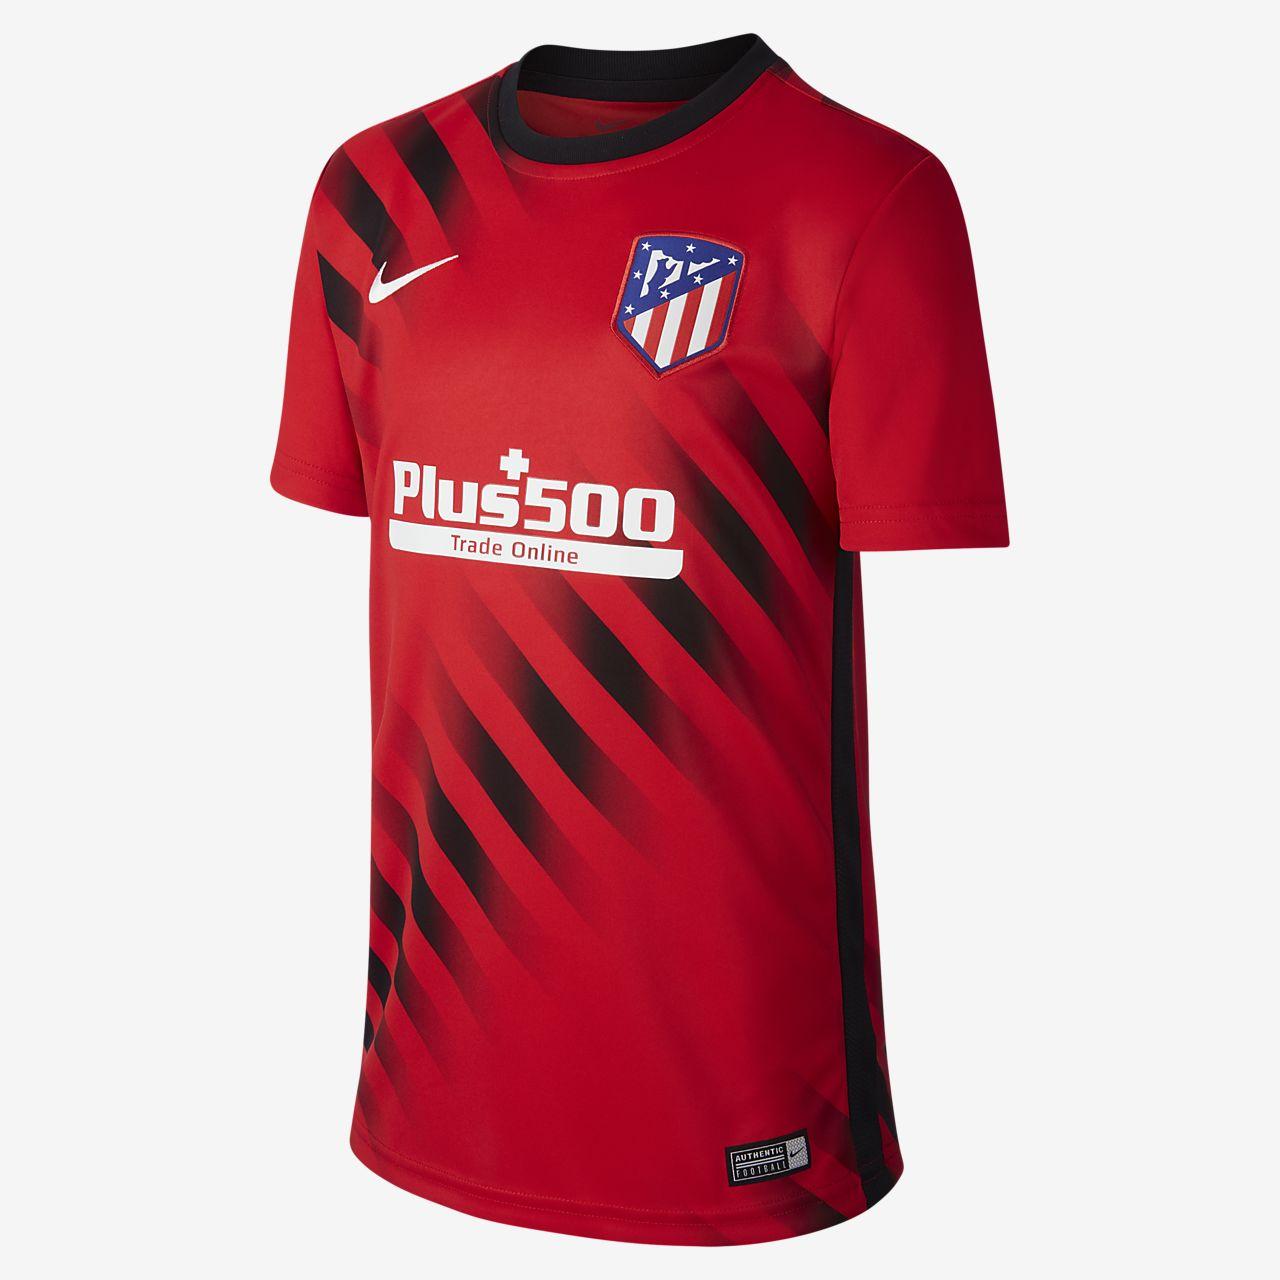 Atlético de Madrid Older Kids' Short-Sleeve Football Top